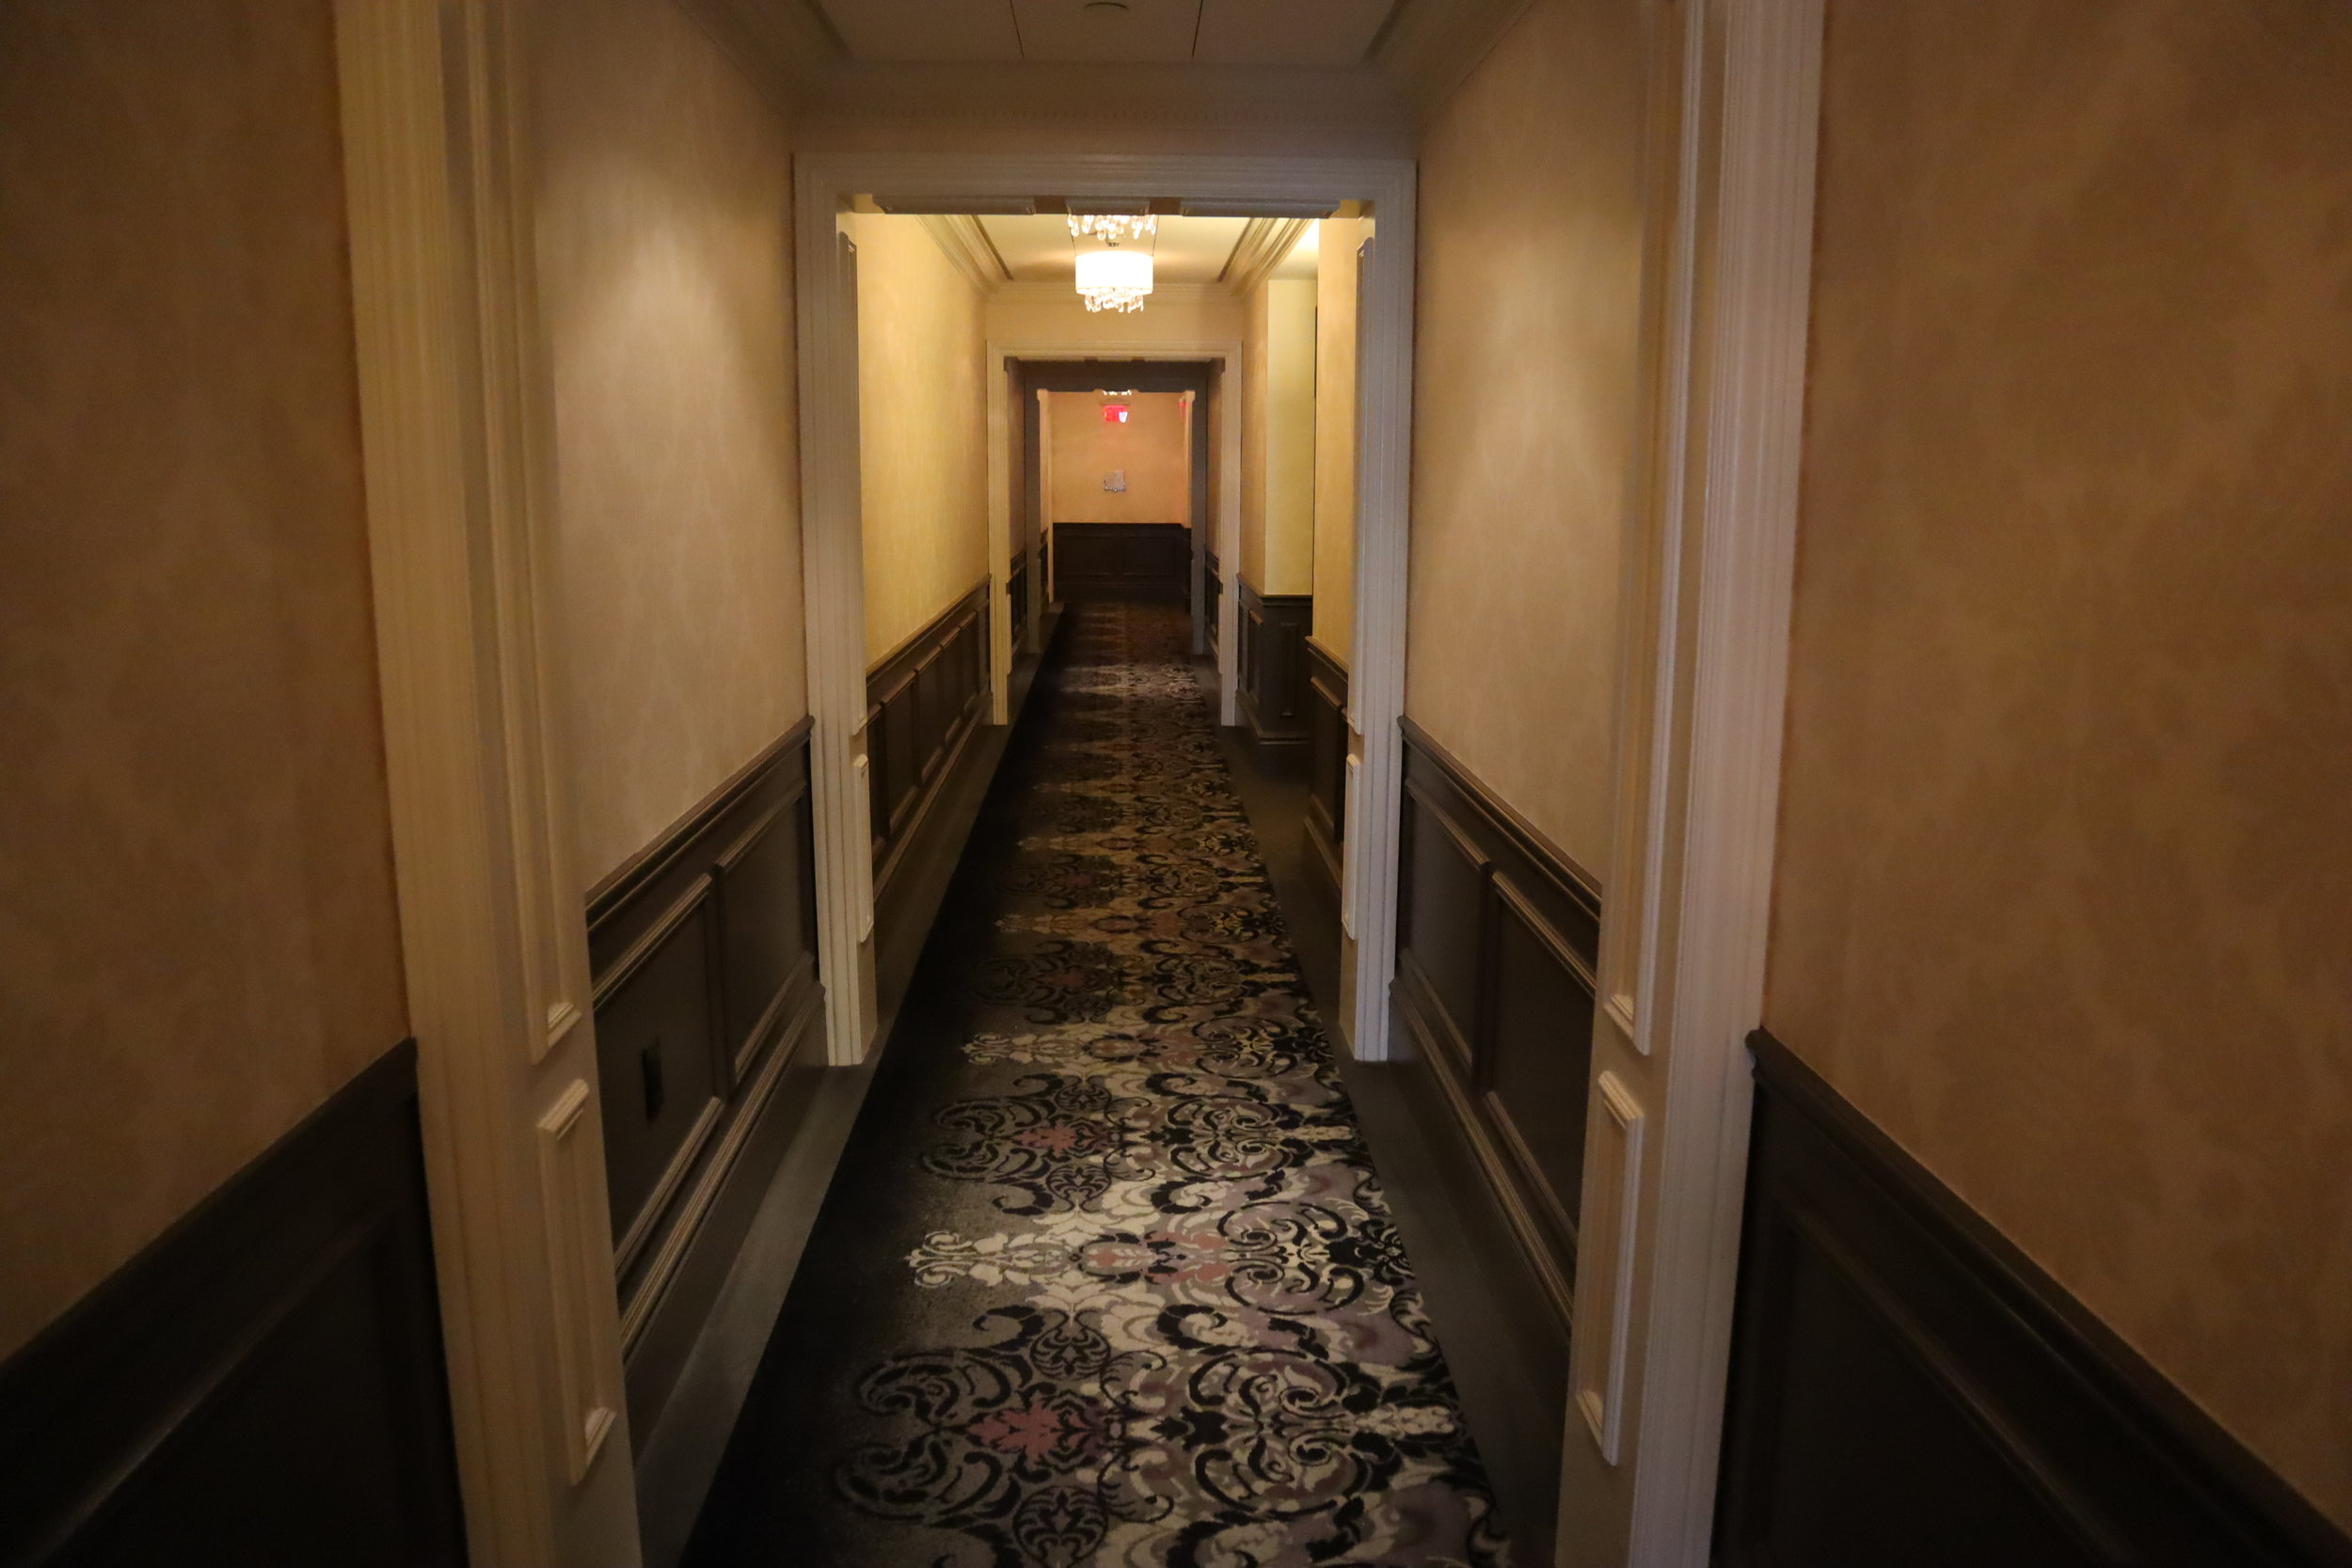 St. Regis Toronto – Hallway